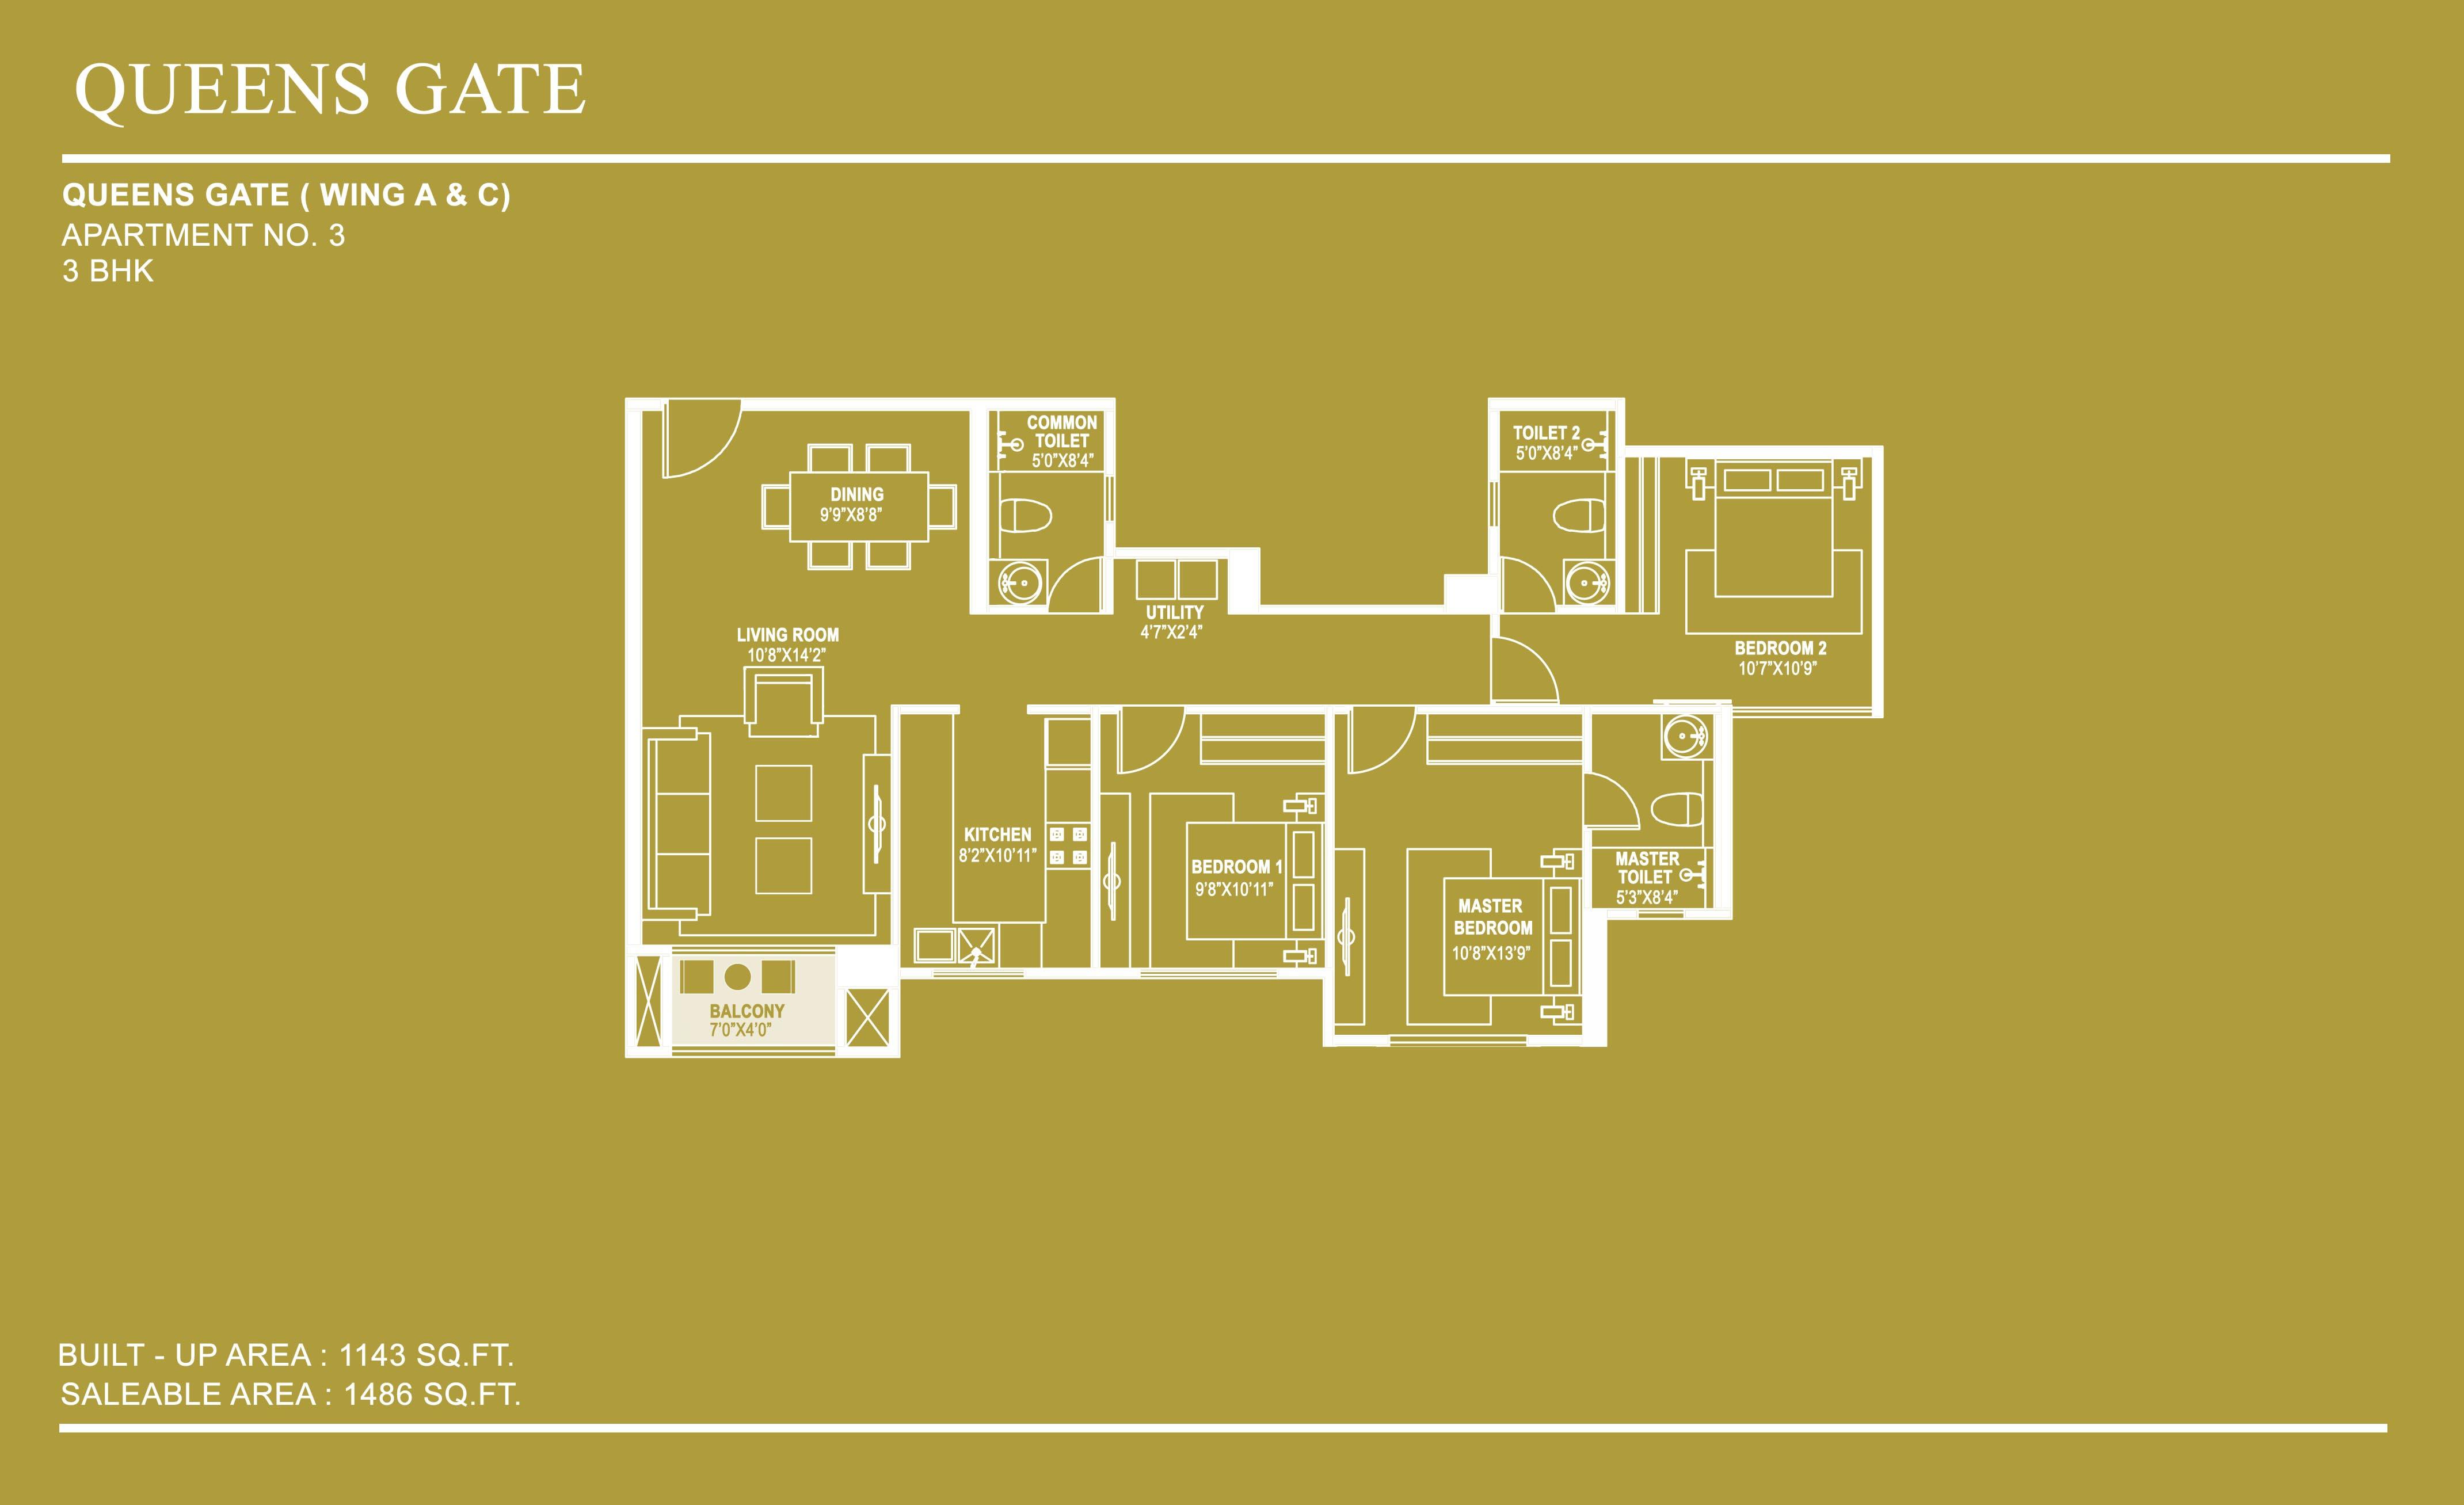 hiranandani queensgate apartment 3bhk 1486sqft1